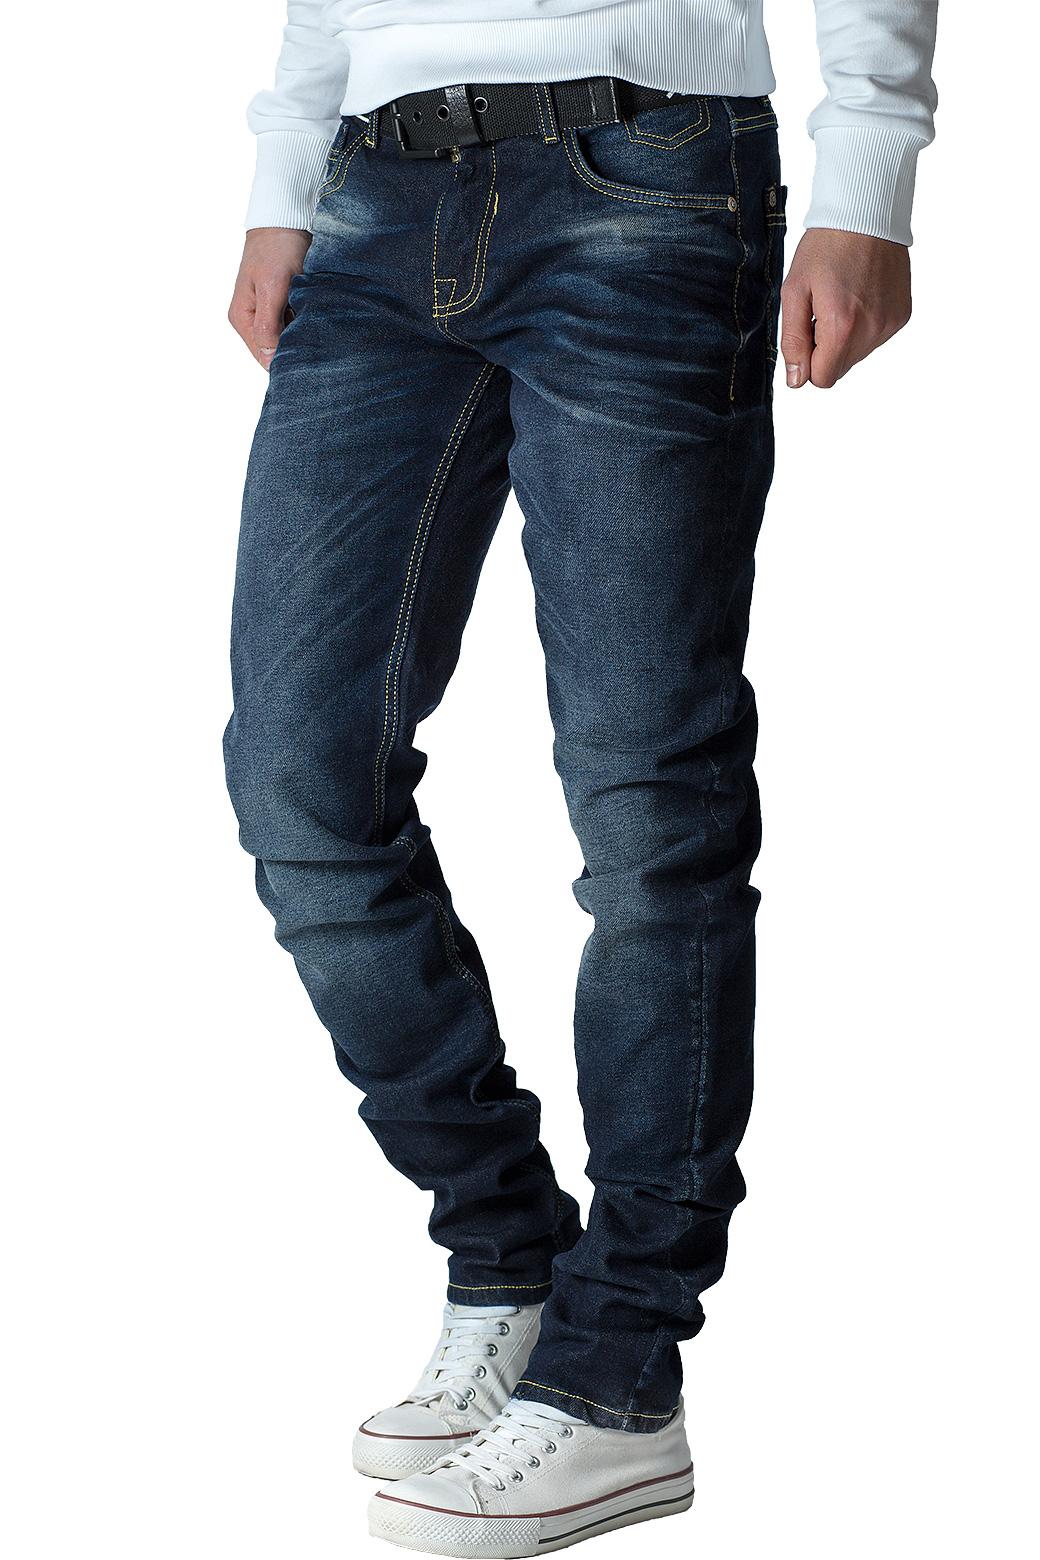 Cipo-amp-Baxx-Uomo-Jeans-Pantaloni-ricamate-Biker-Style-streetwear-nervature-pattern-Dope miniatura 31